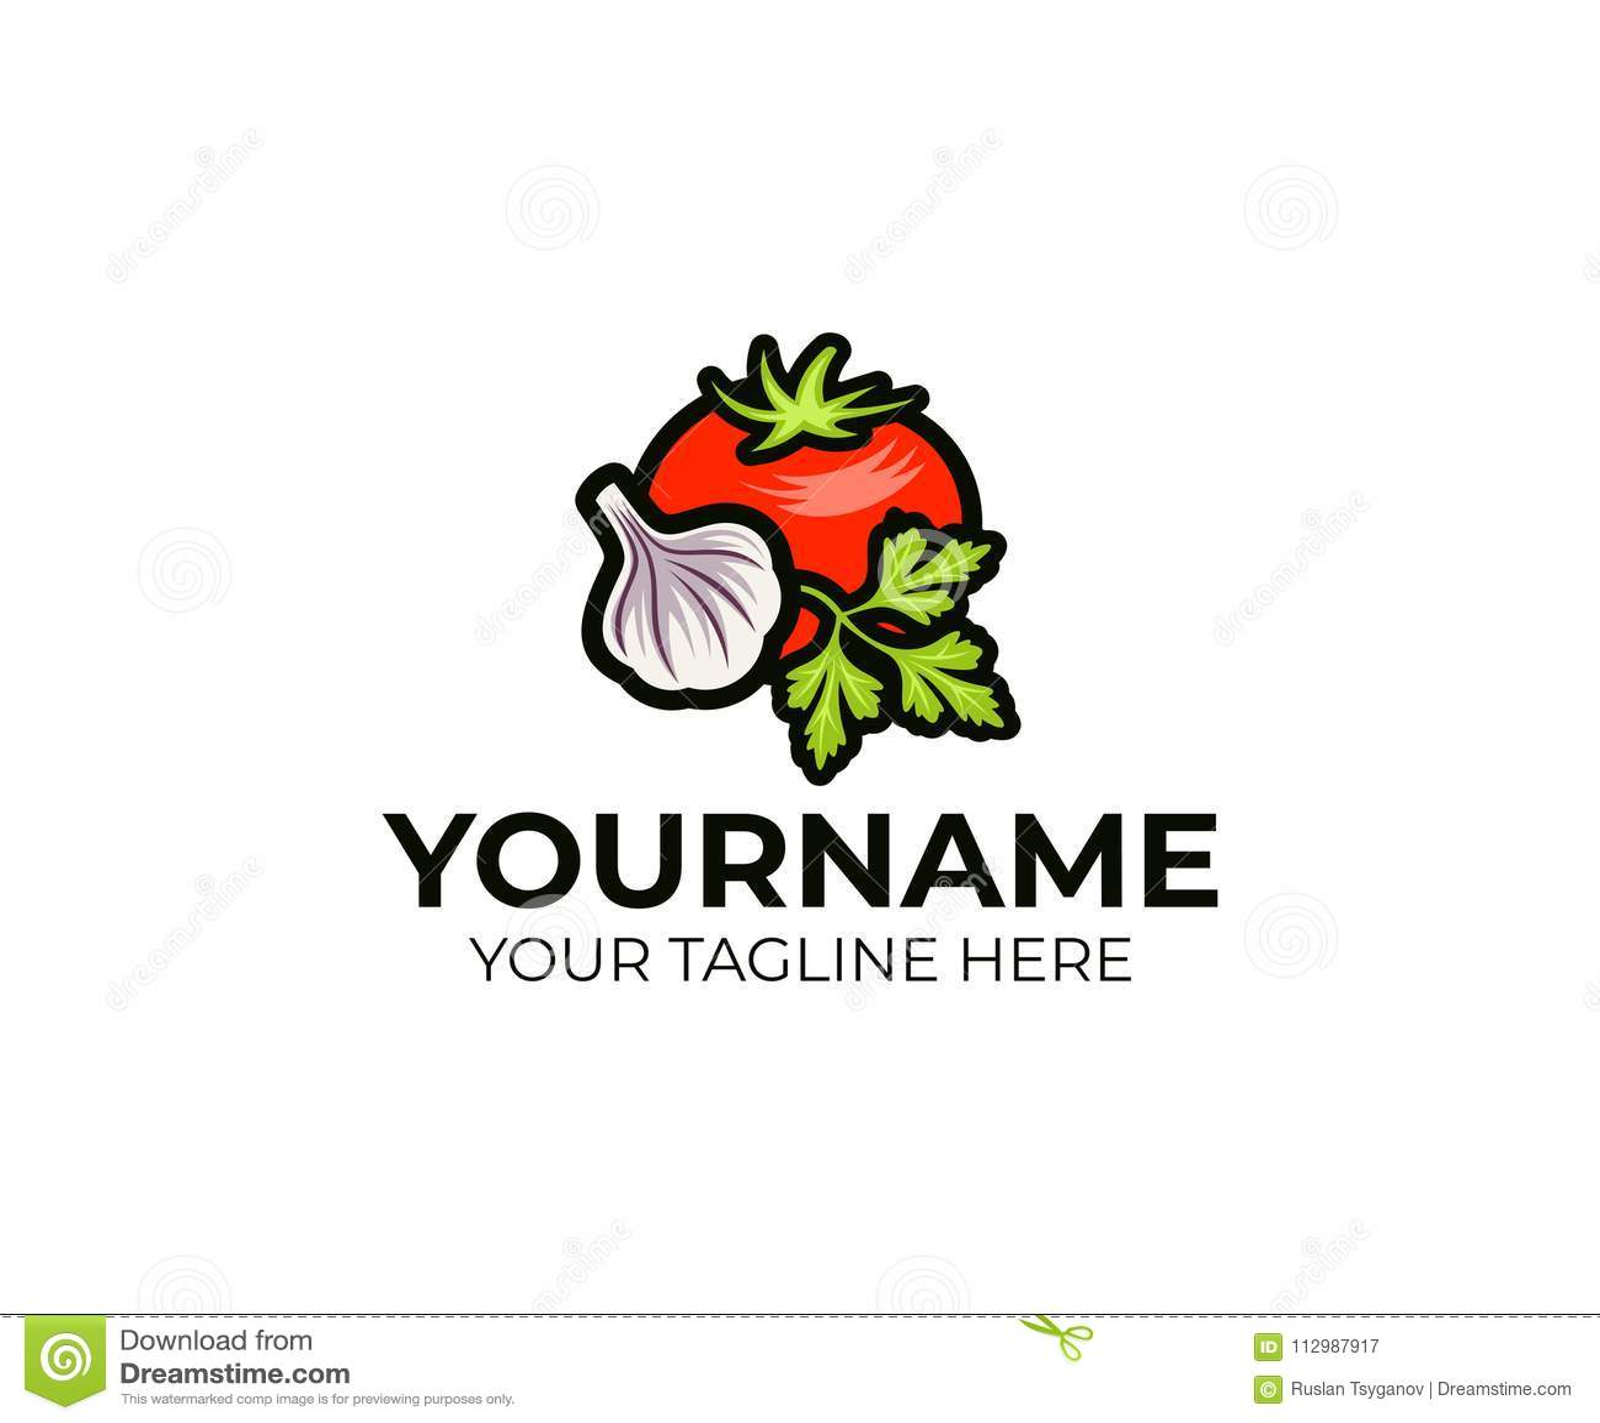 Tomato, garlic and parsley logo template. Vegetable still life vector design